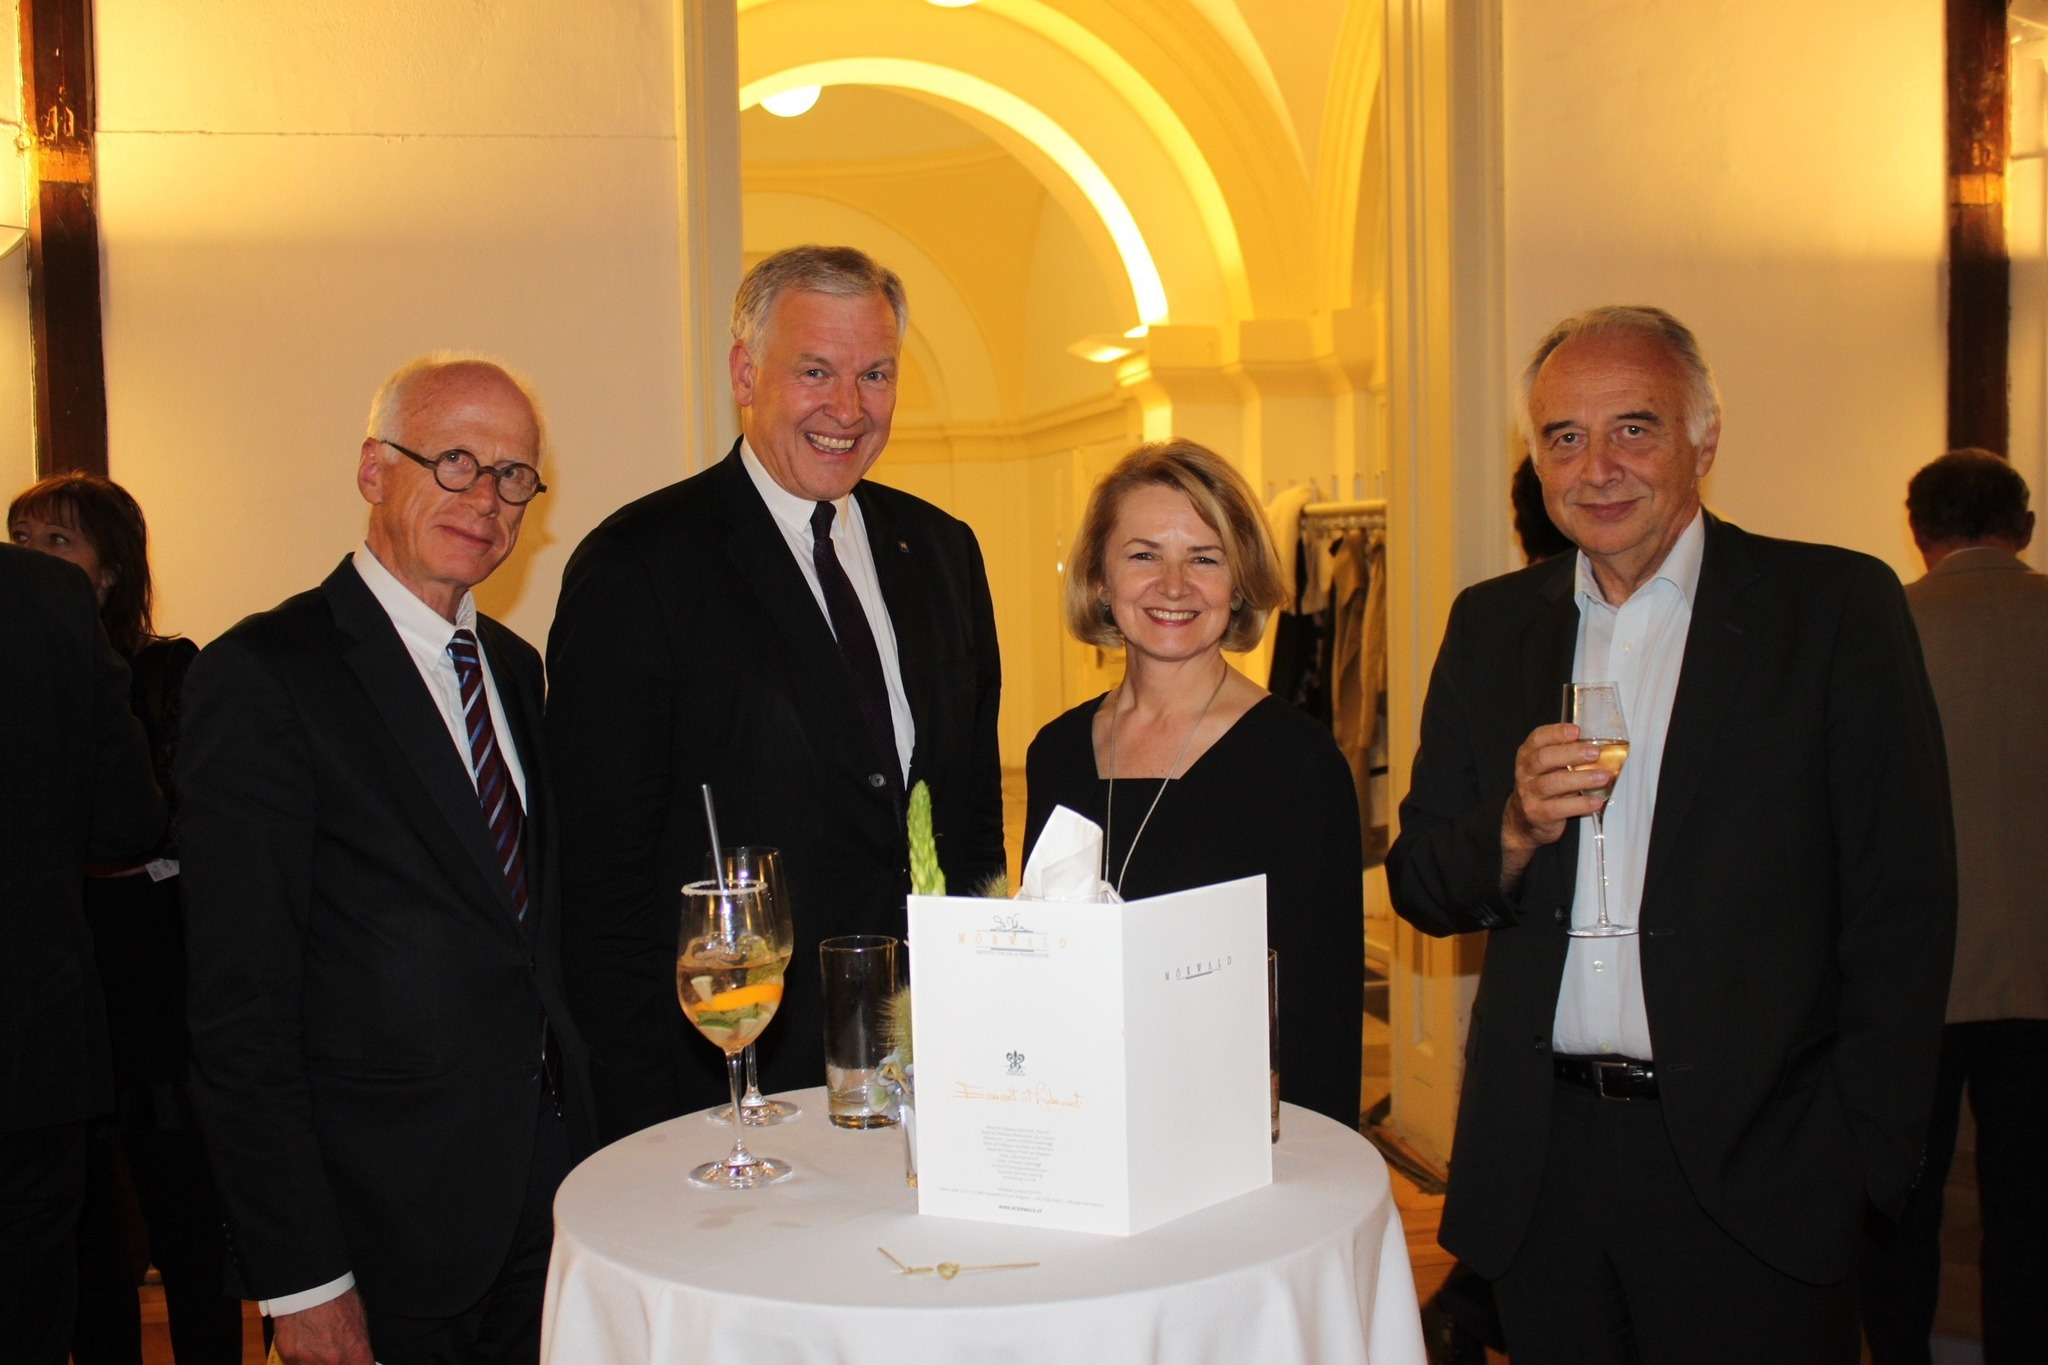 Grafenegg in Krems - Thema auf chad-manufacturing.com